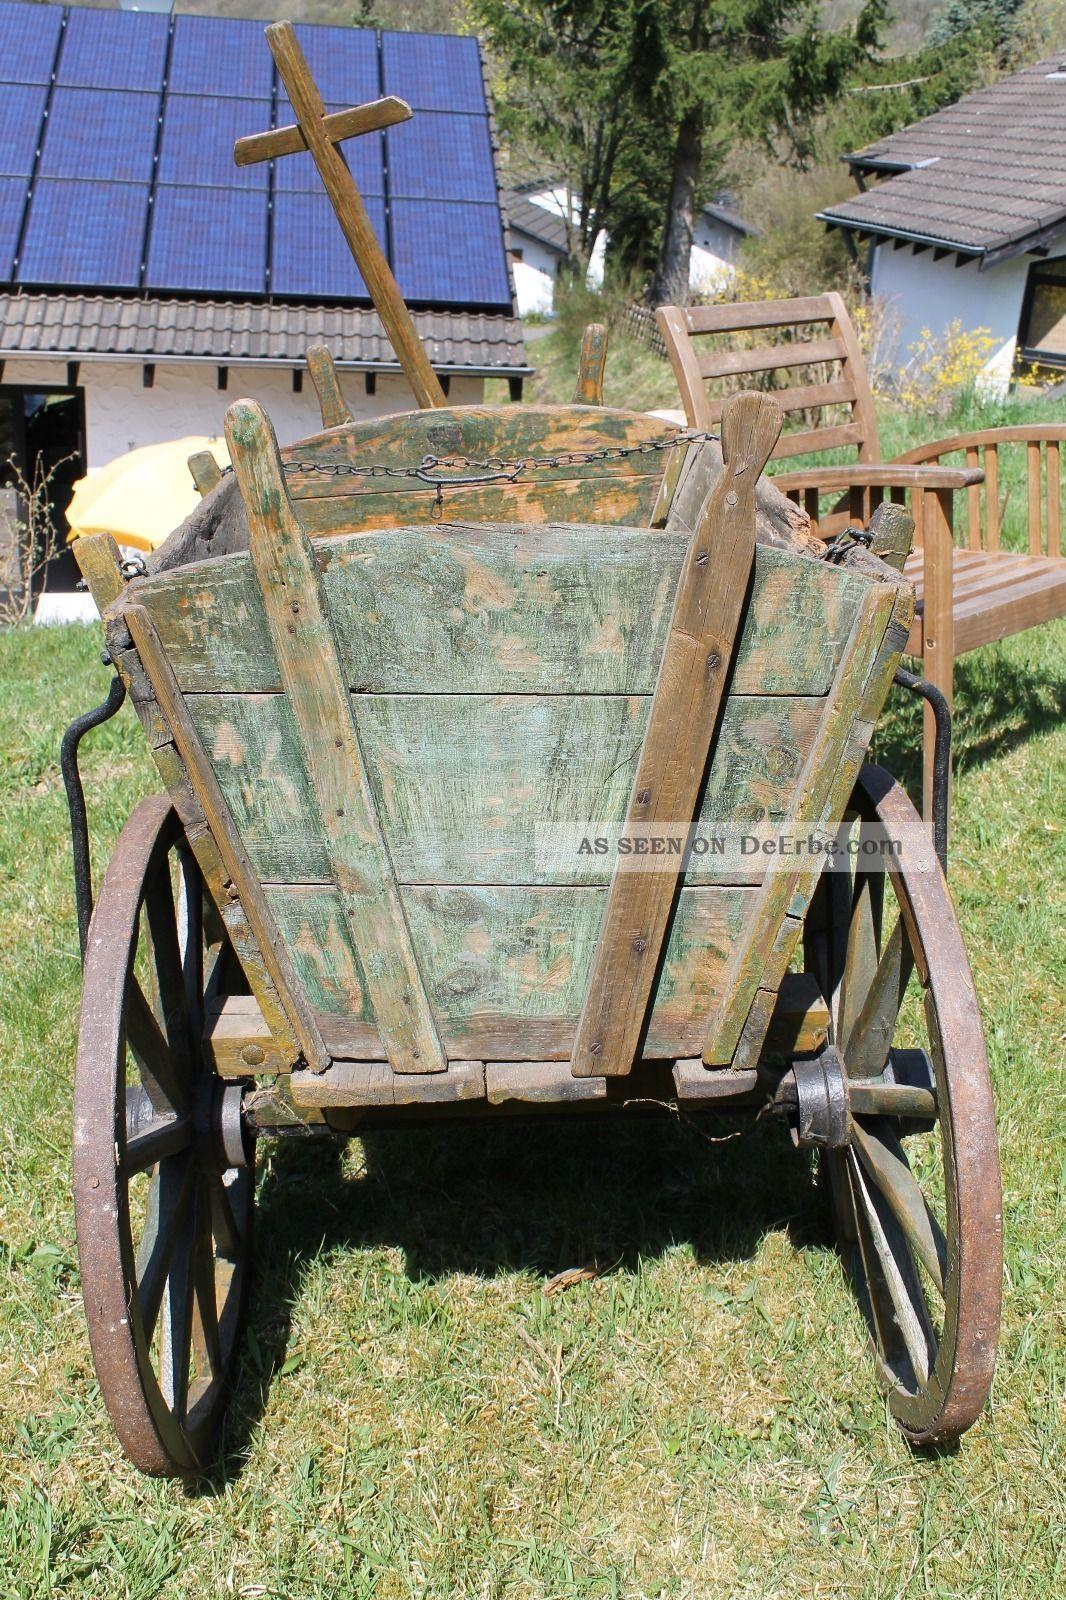 alter bollerwagen handwagen aus holz ma e. Black Bedroom Furniture Sets. Home Design Ideas